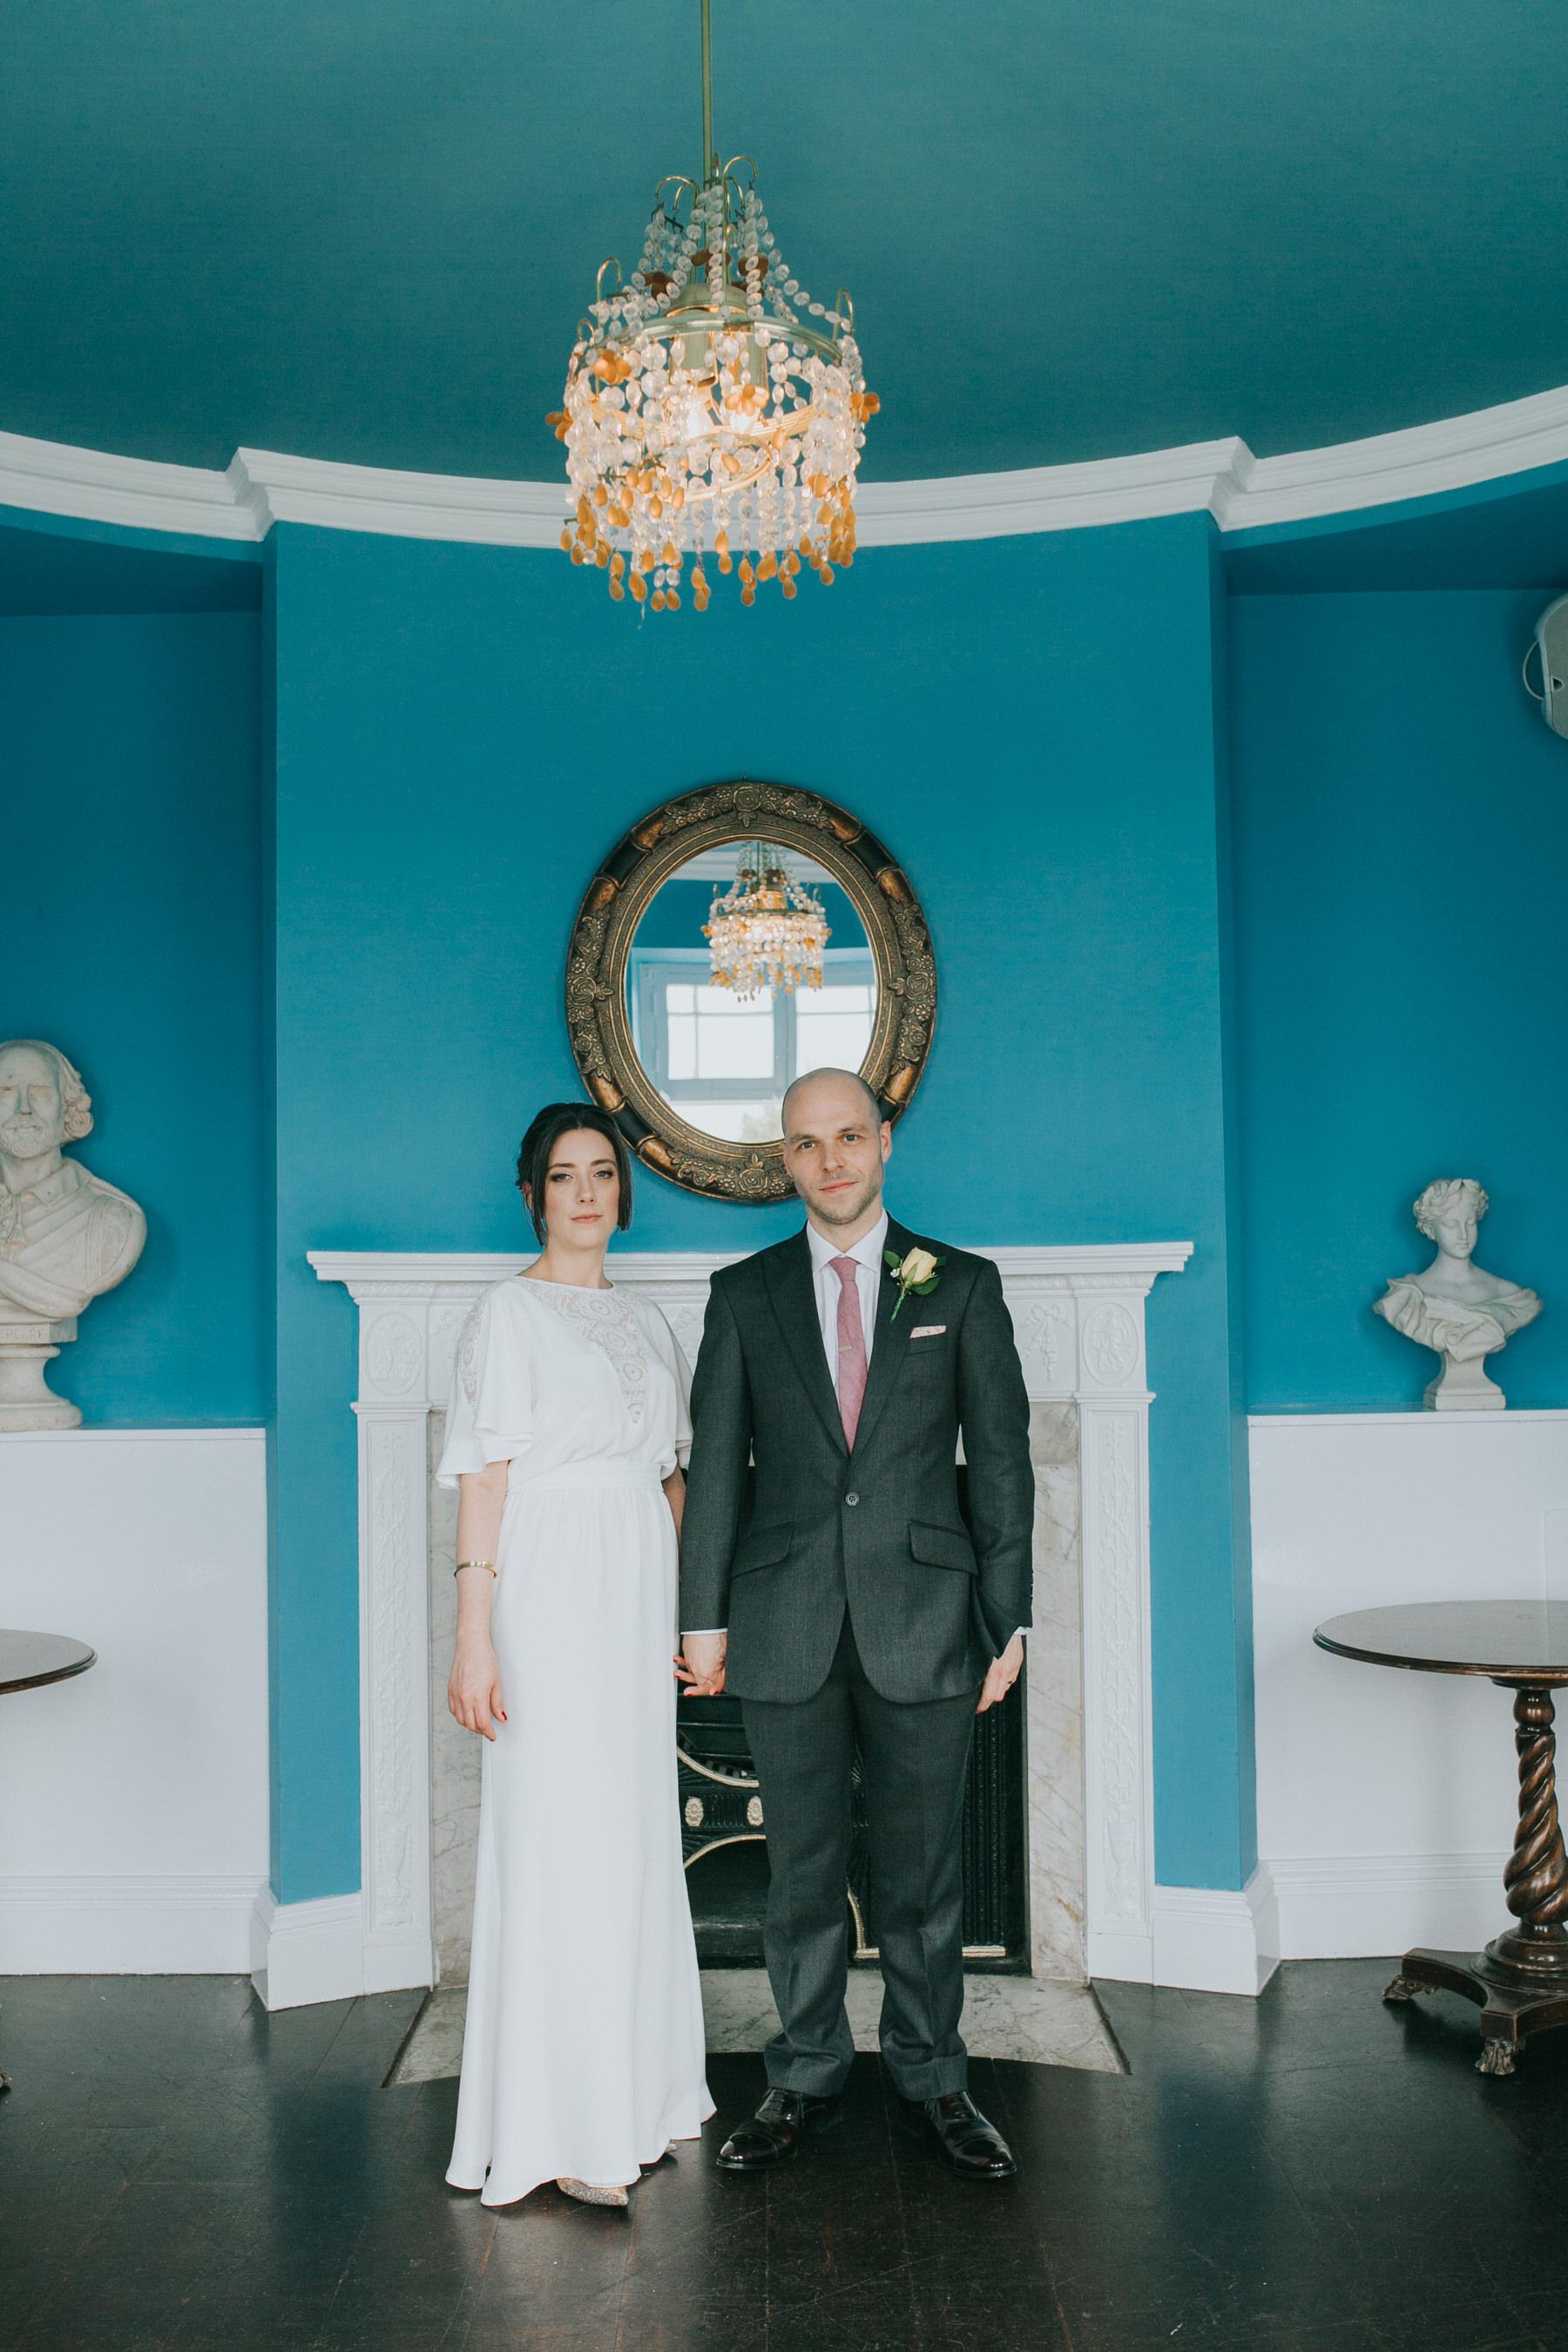 212 Belair House blue room wedding couple pose.jpg